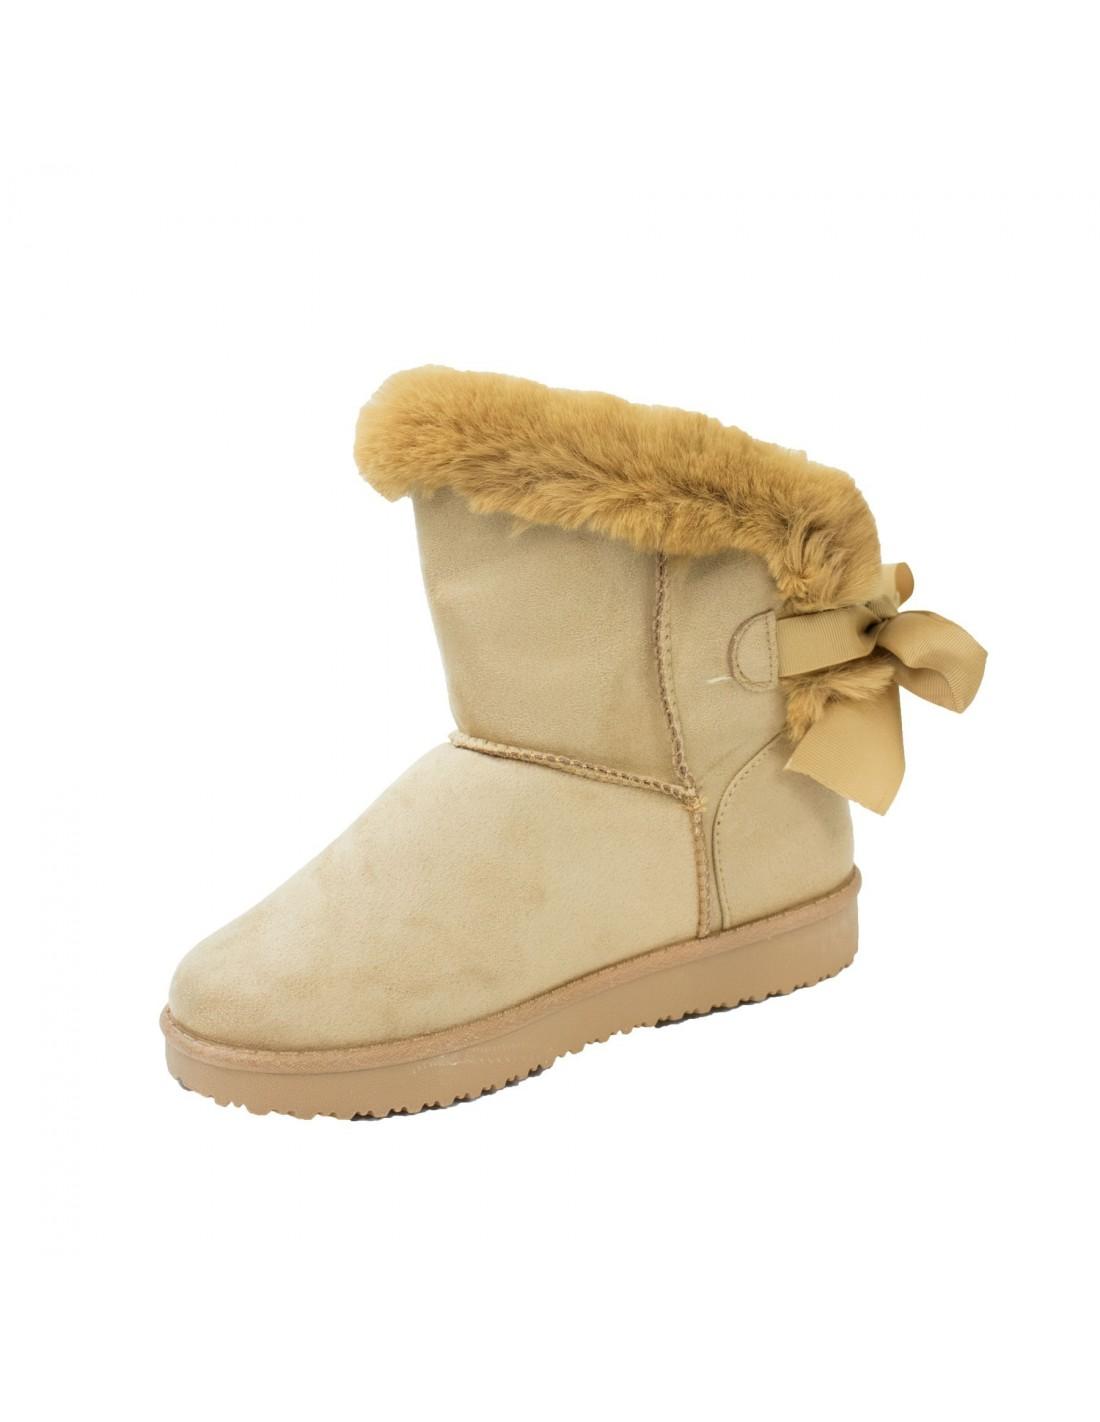 boots femme fourr es camel fantaisie ruban fourrure. Black Bedroom Furniture Sets. Home Design Ideas